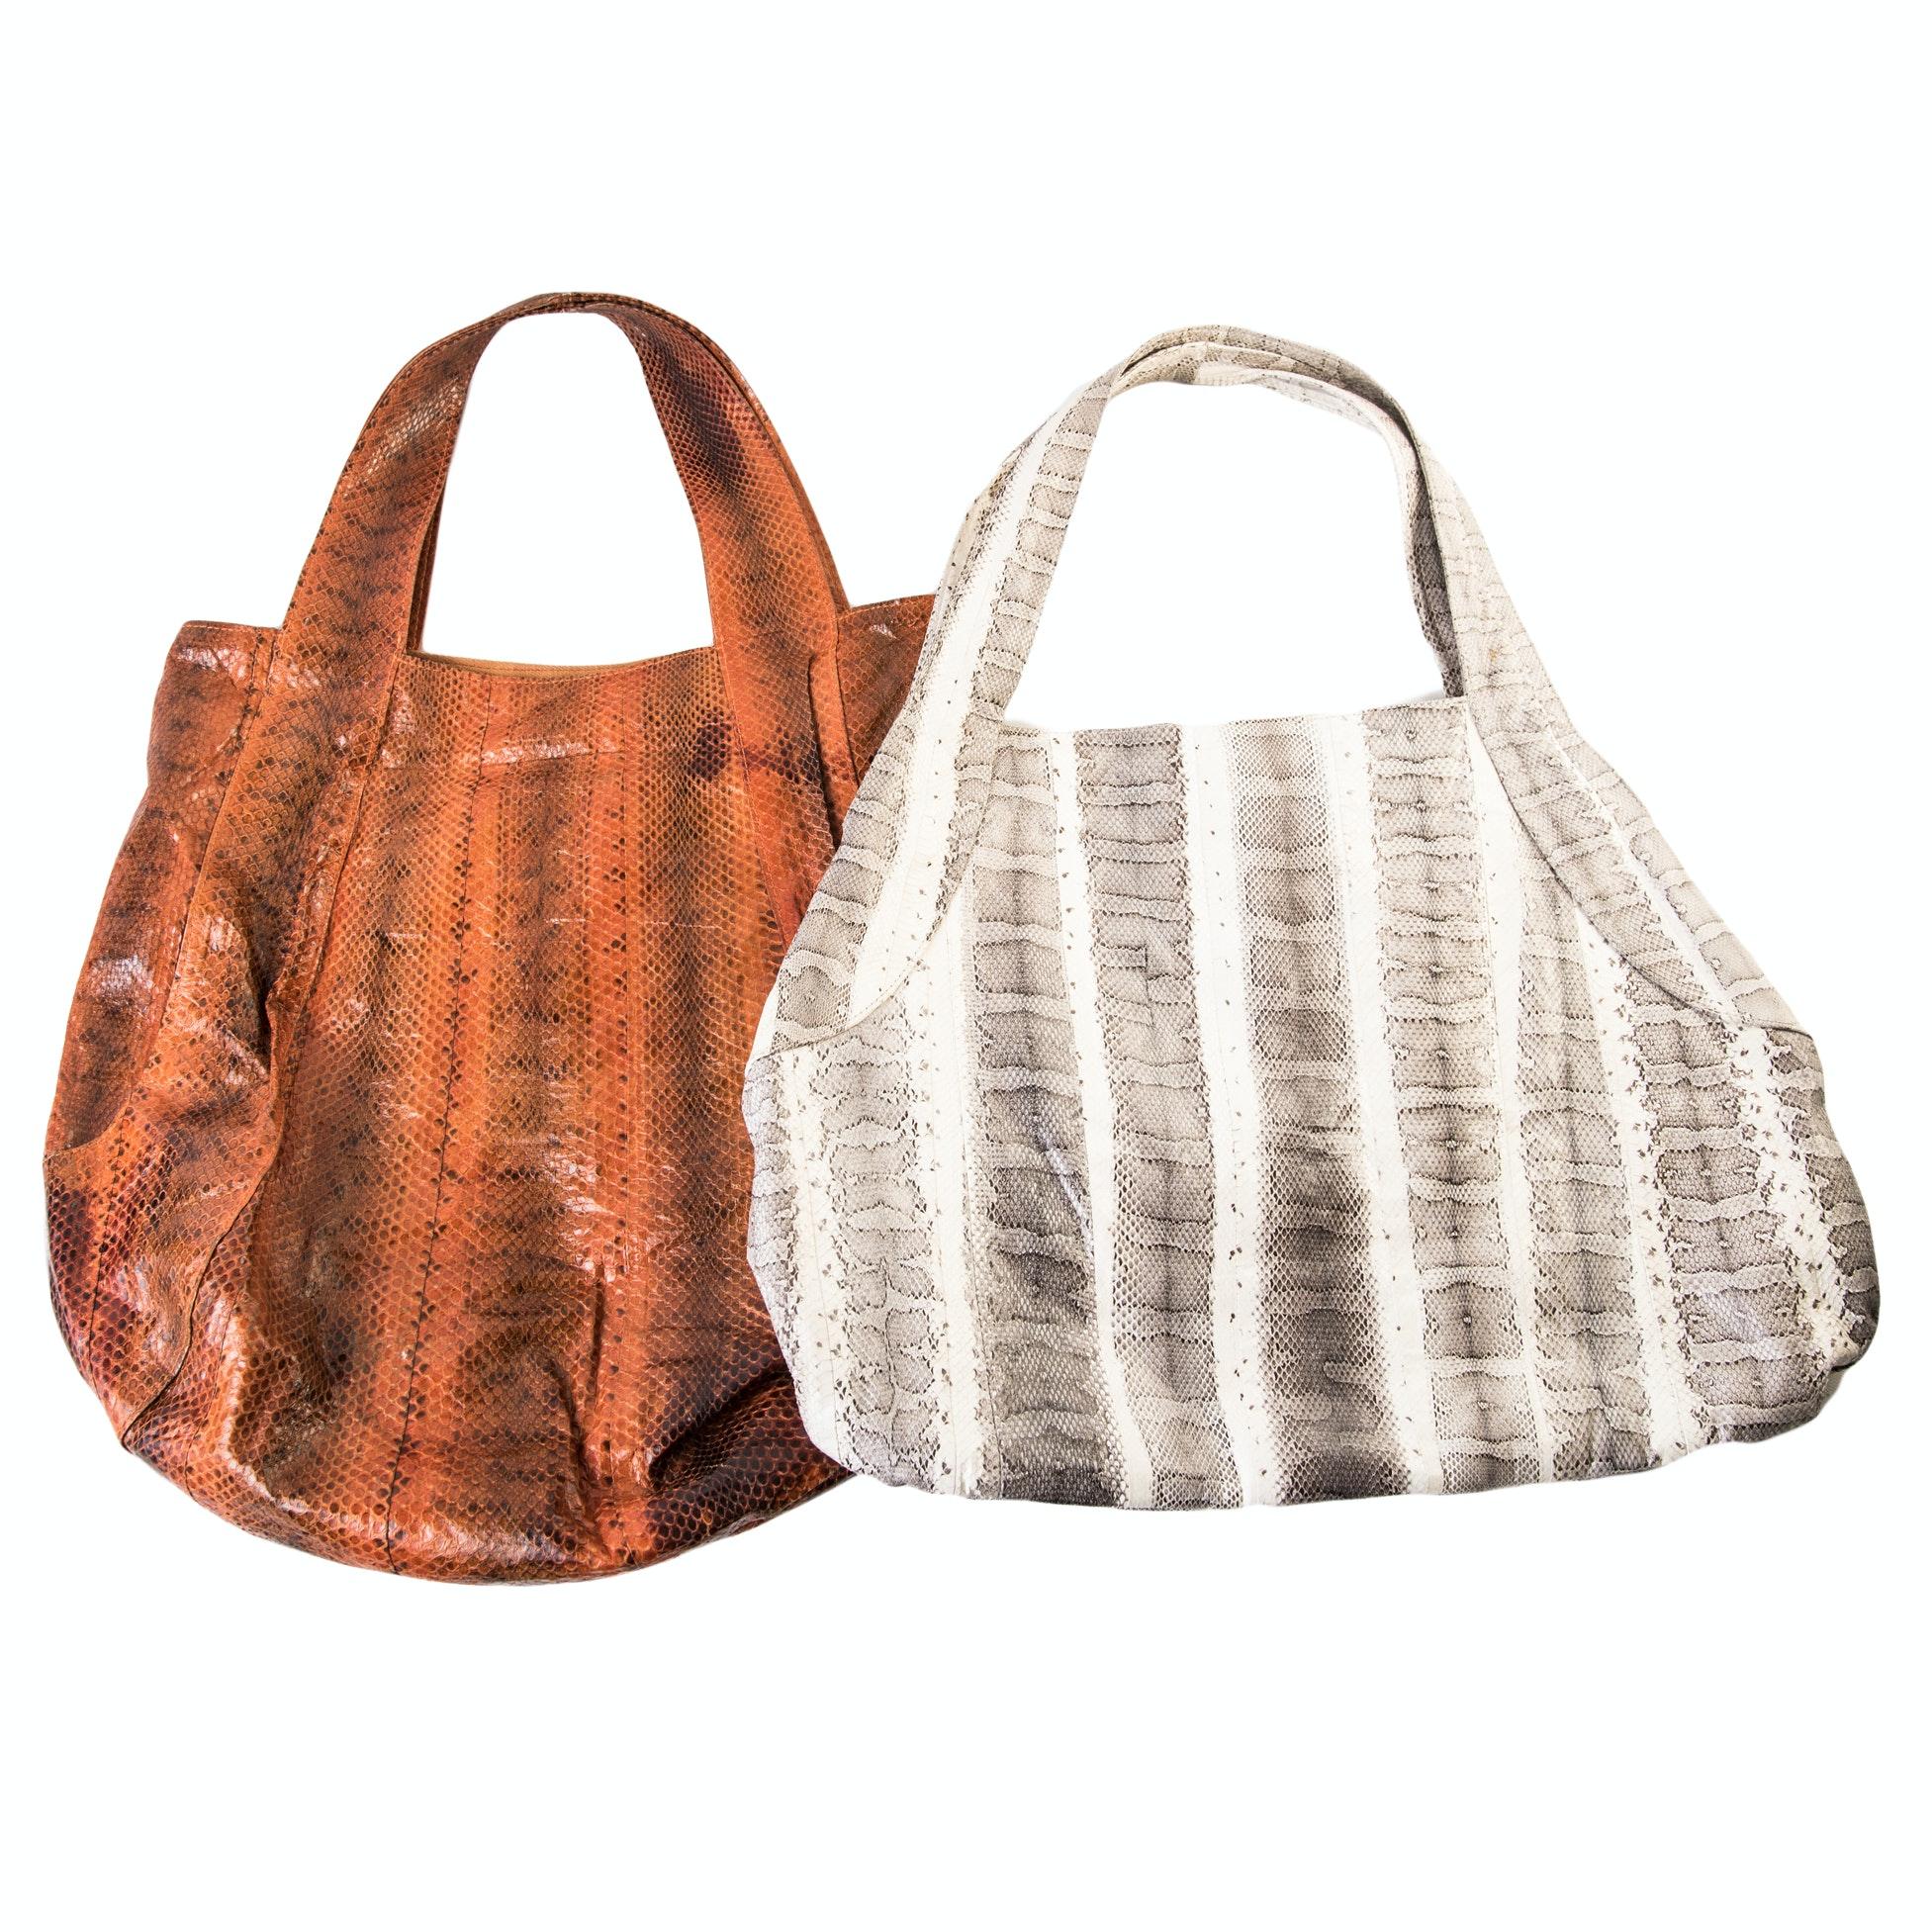 Beirn Jenna Snakeskin Tote Handbags